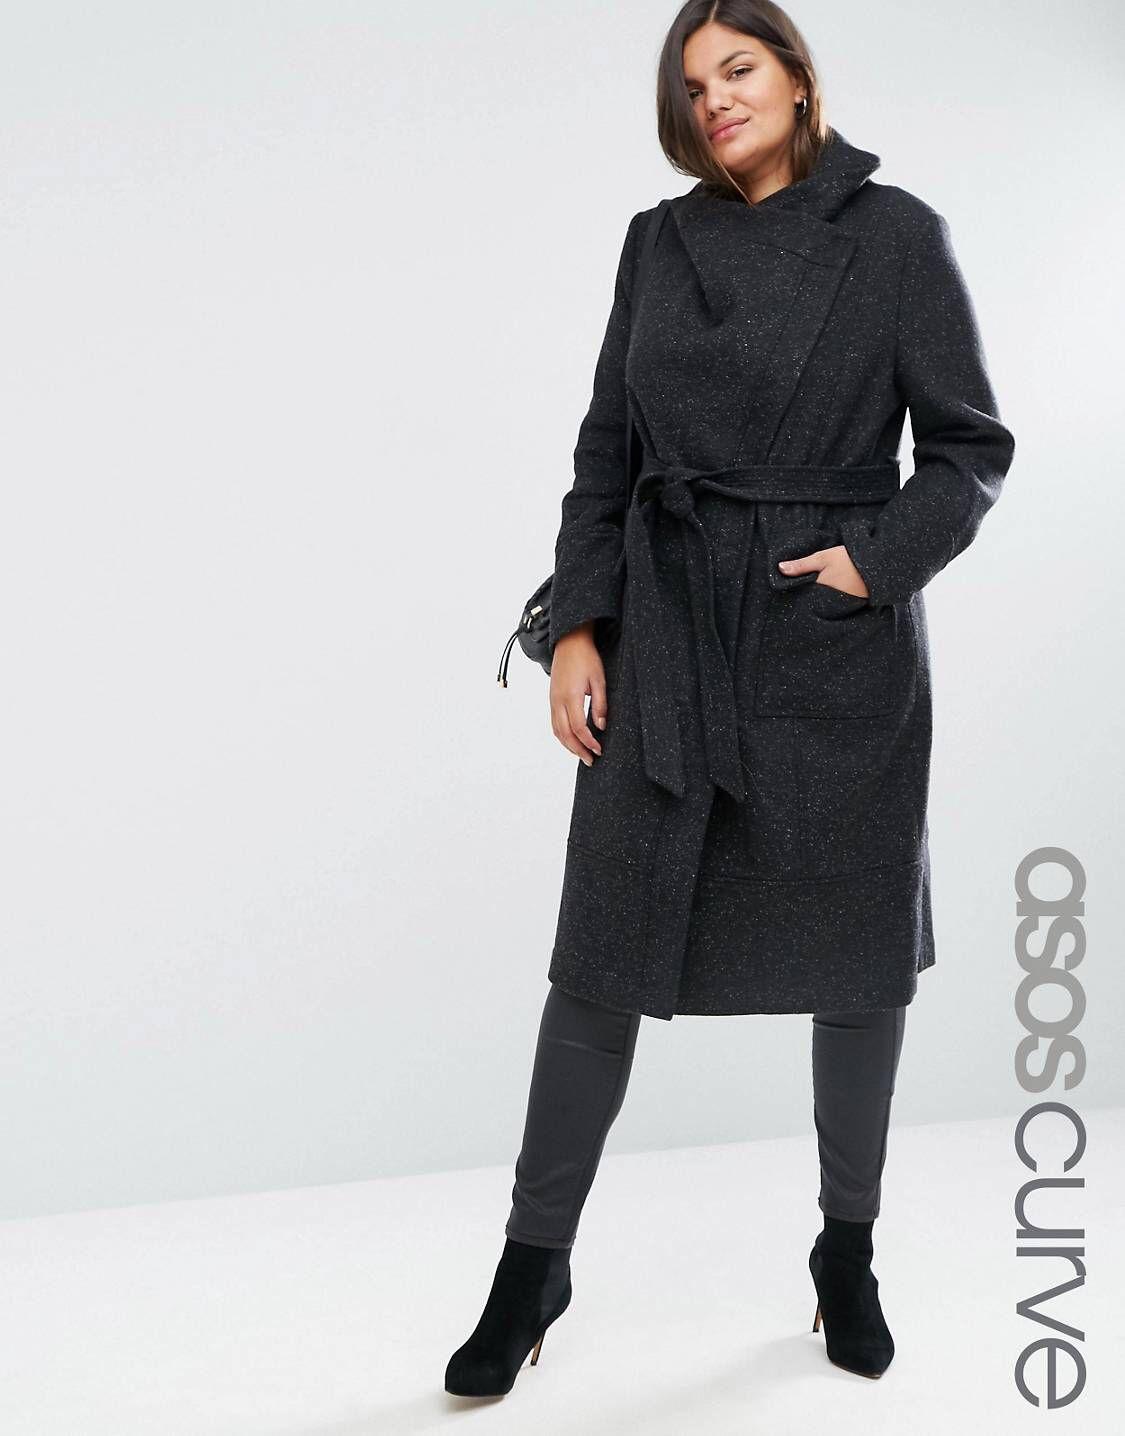 a366305e6e8 Dammmmn ASOS with the lush coats!